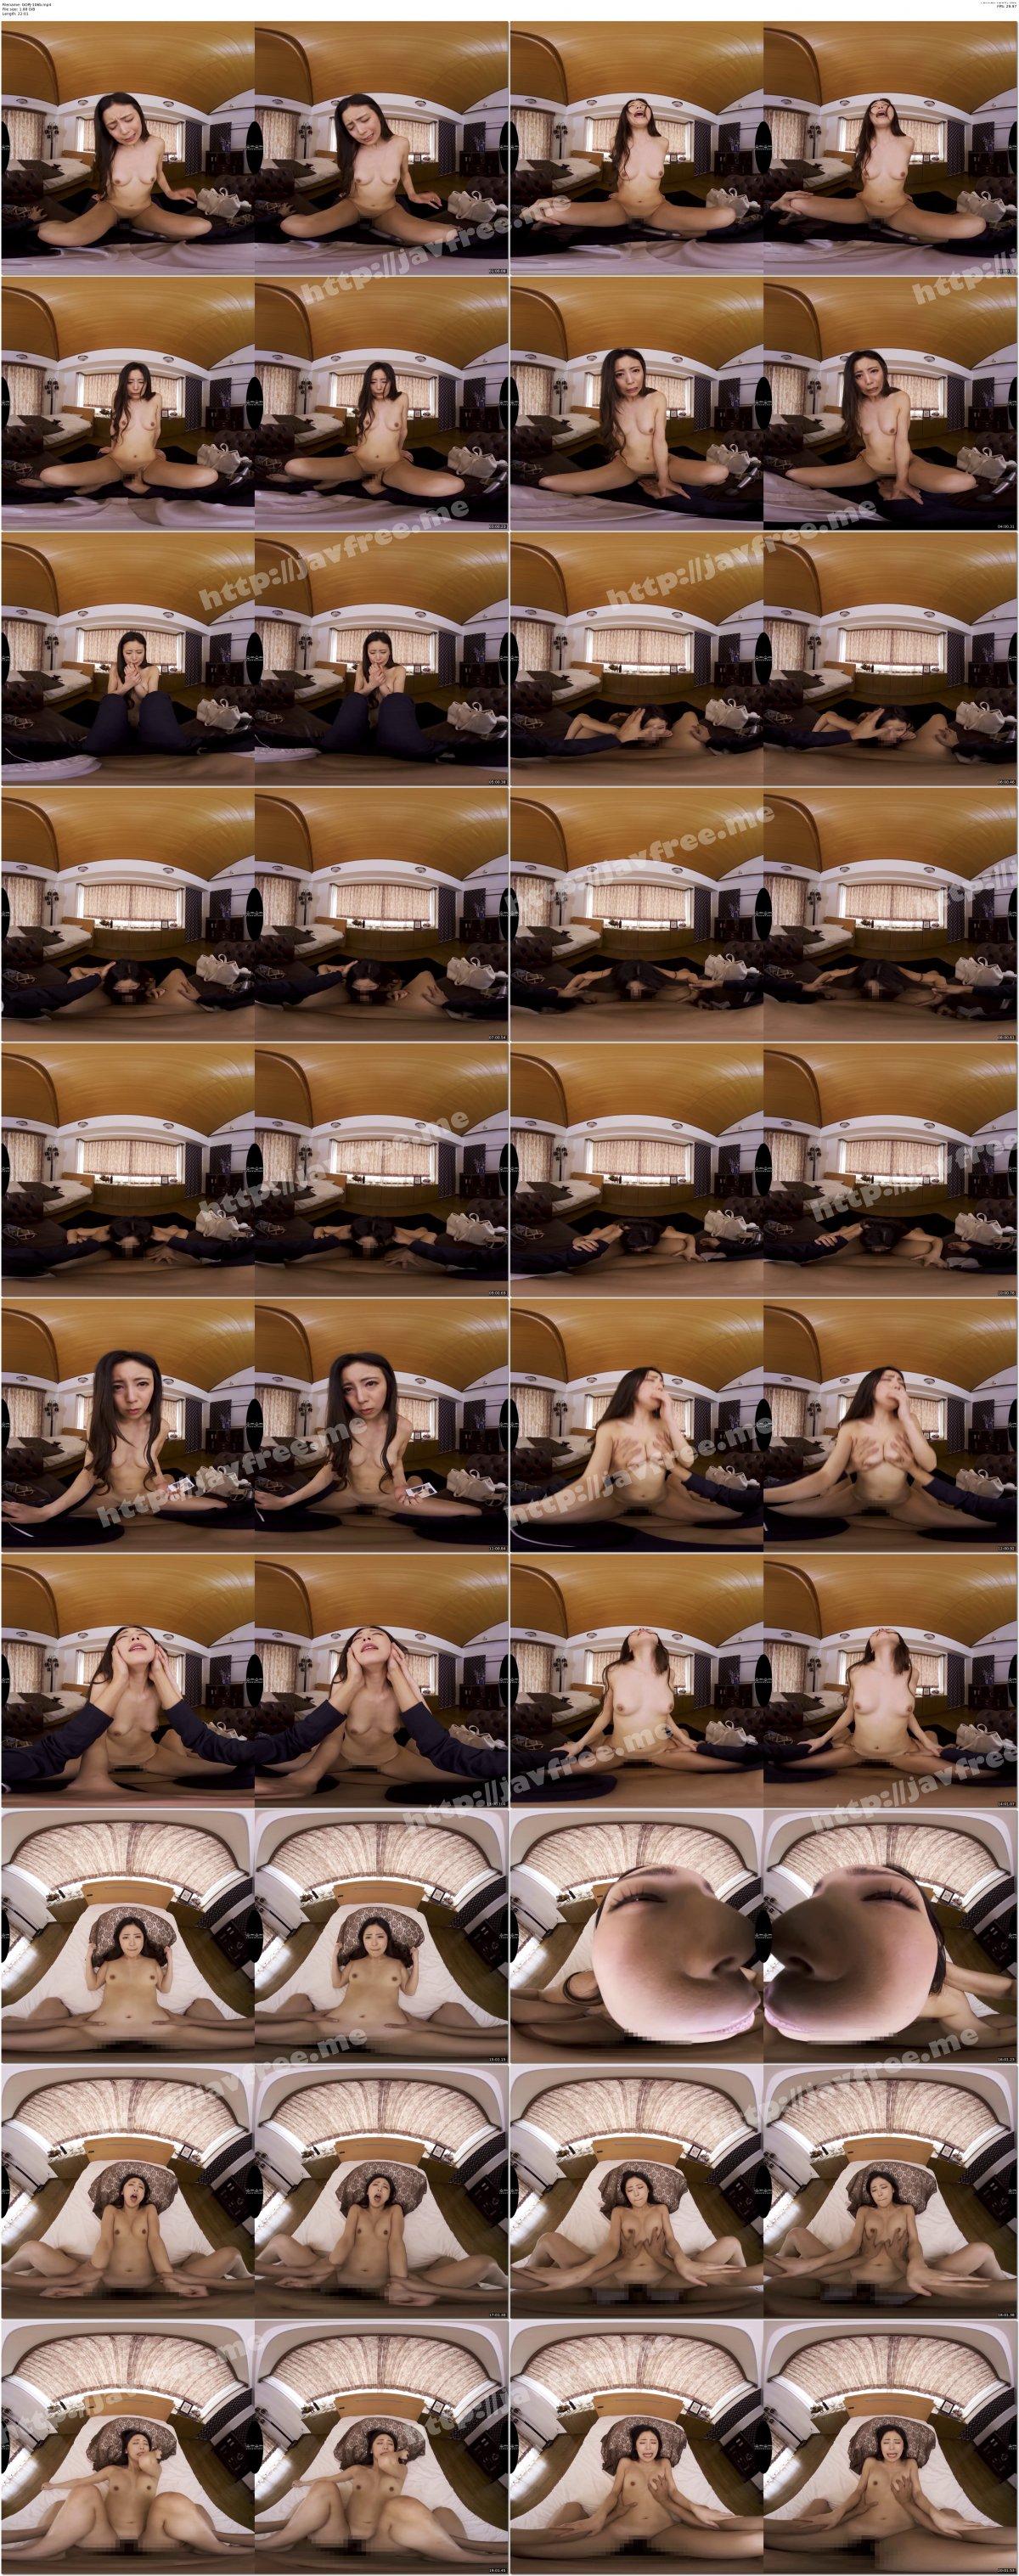 [GOPJ-106] 【VR】劇的高画質 星川凛々花 リ●ンジポルノ 5 - image GOPJ-106b on https://javfree.me